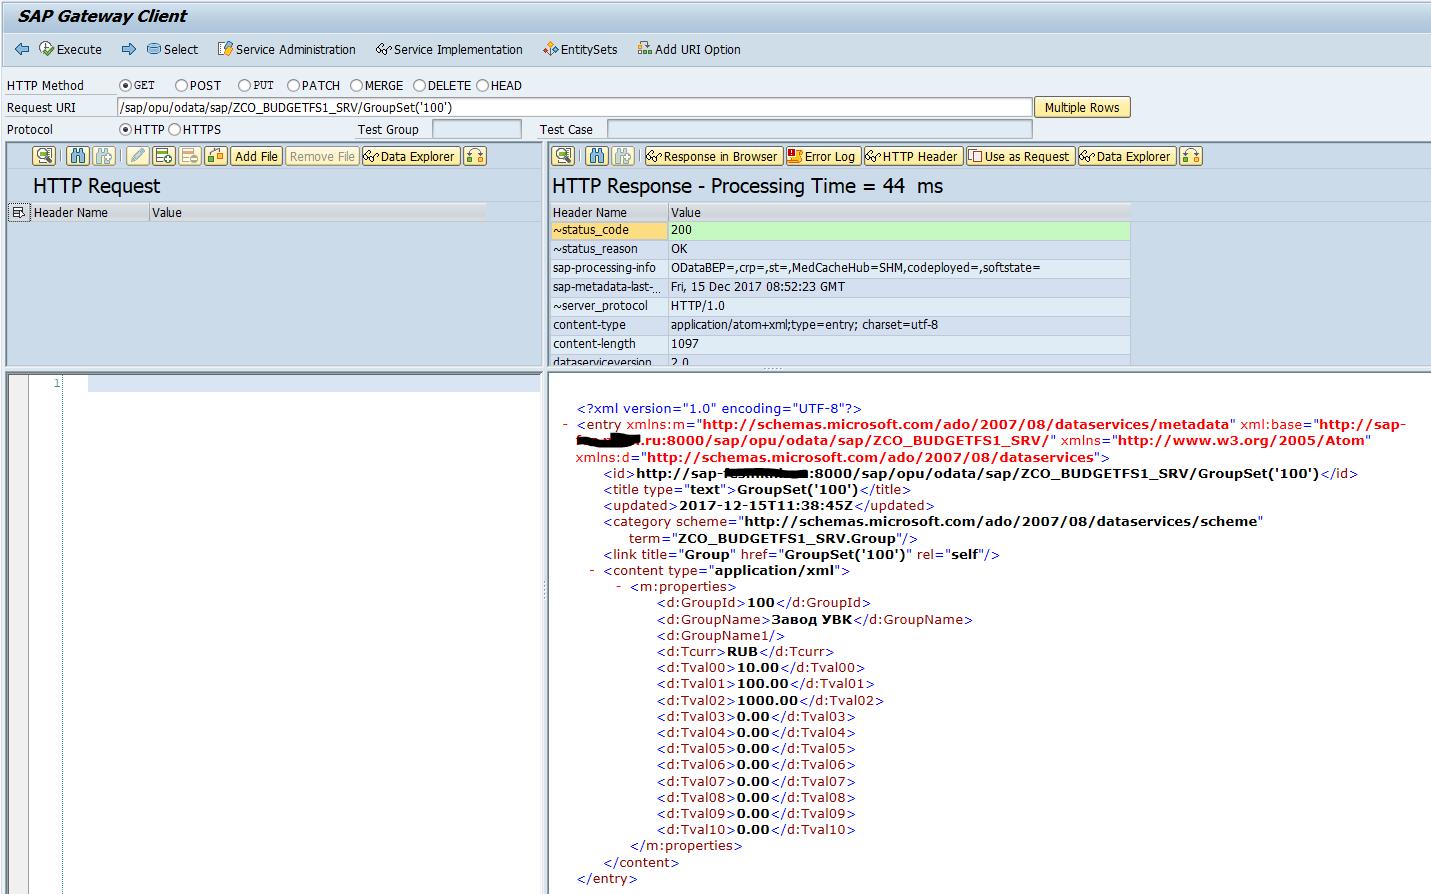 Sap Gateway Client oData